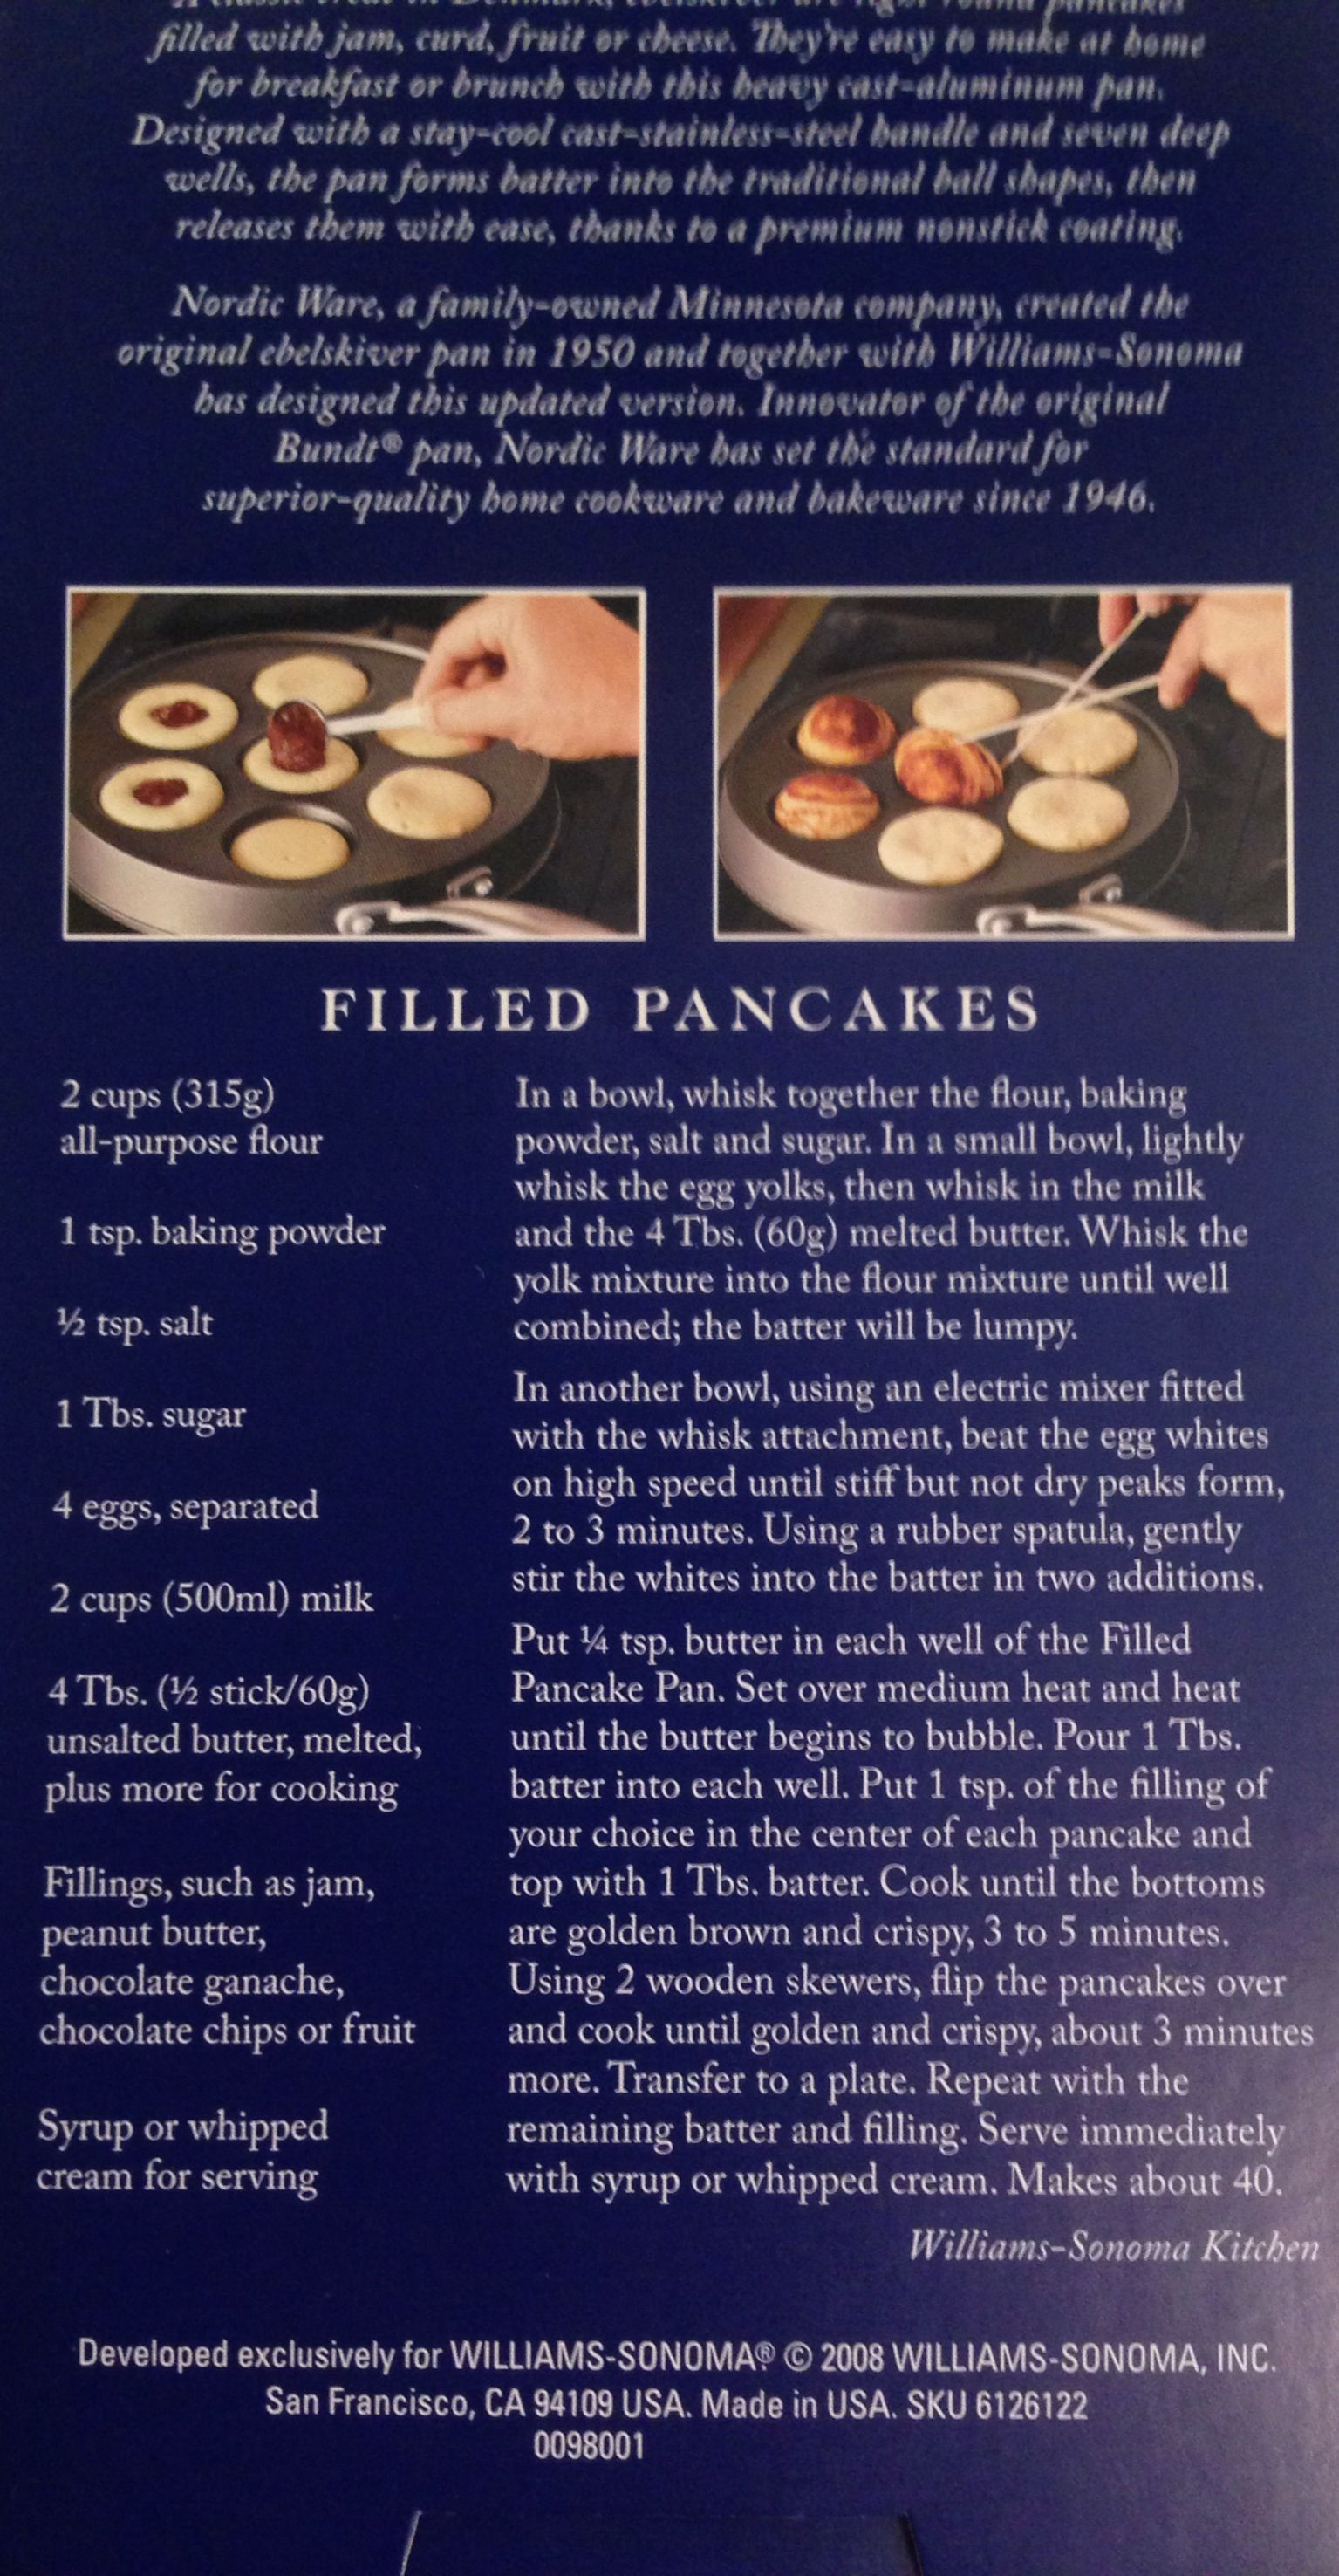 Photo of Williams-Sonoma Ebelskiver filled pancake recipe